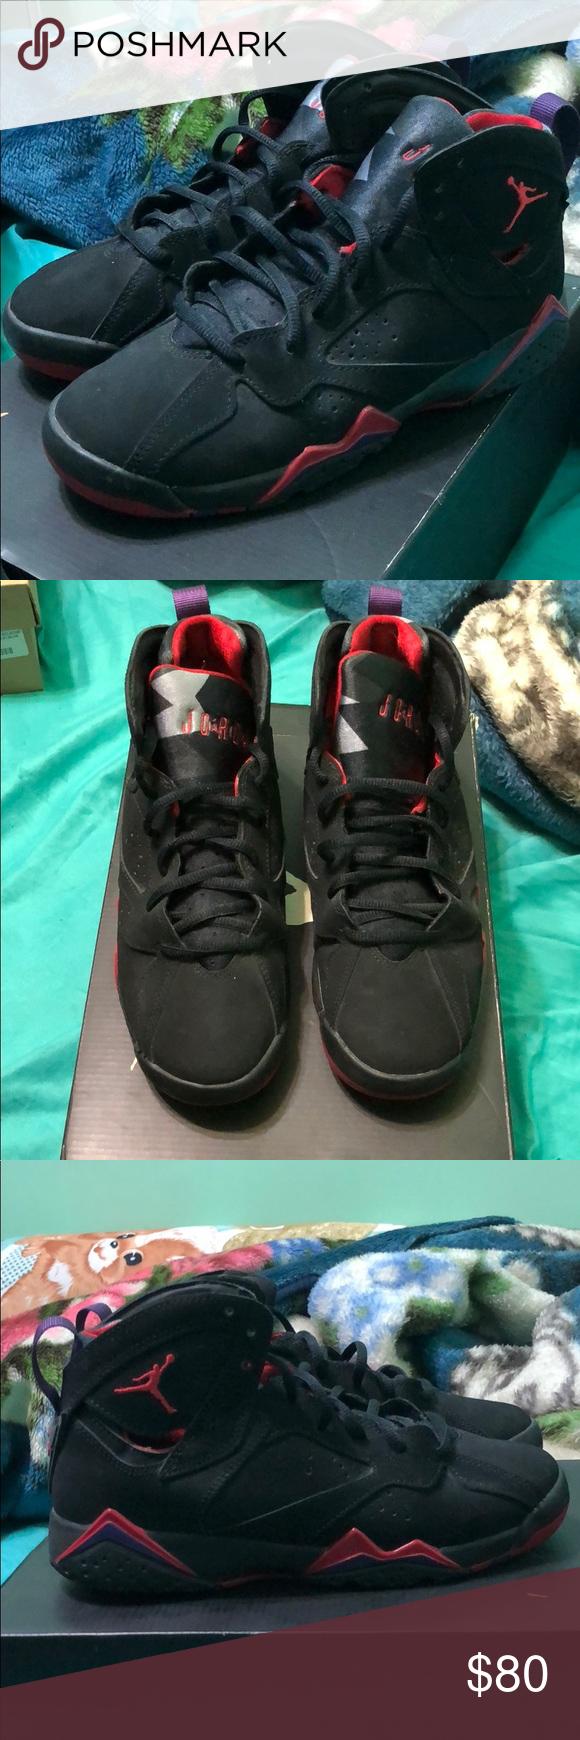 new product 5fa06 a6124 Air Jordan Retro 7 Raptors Worn a couple times 7/10 Size: 6 ...